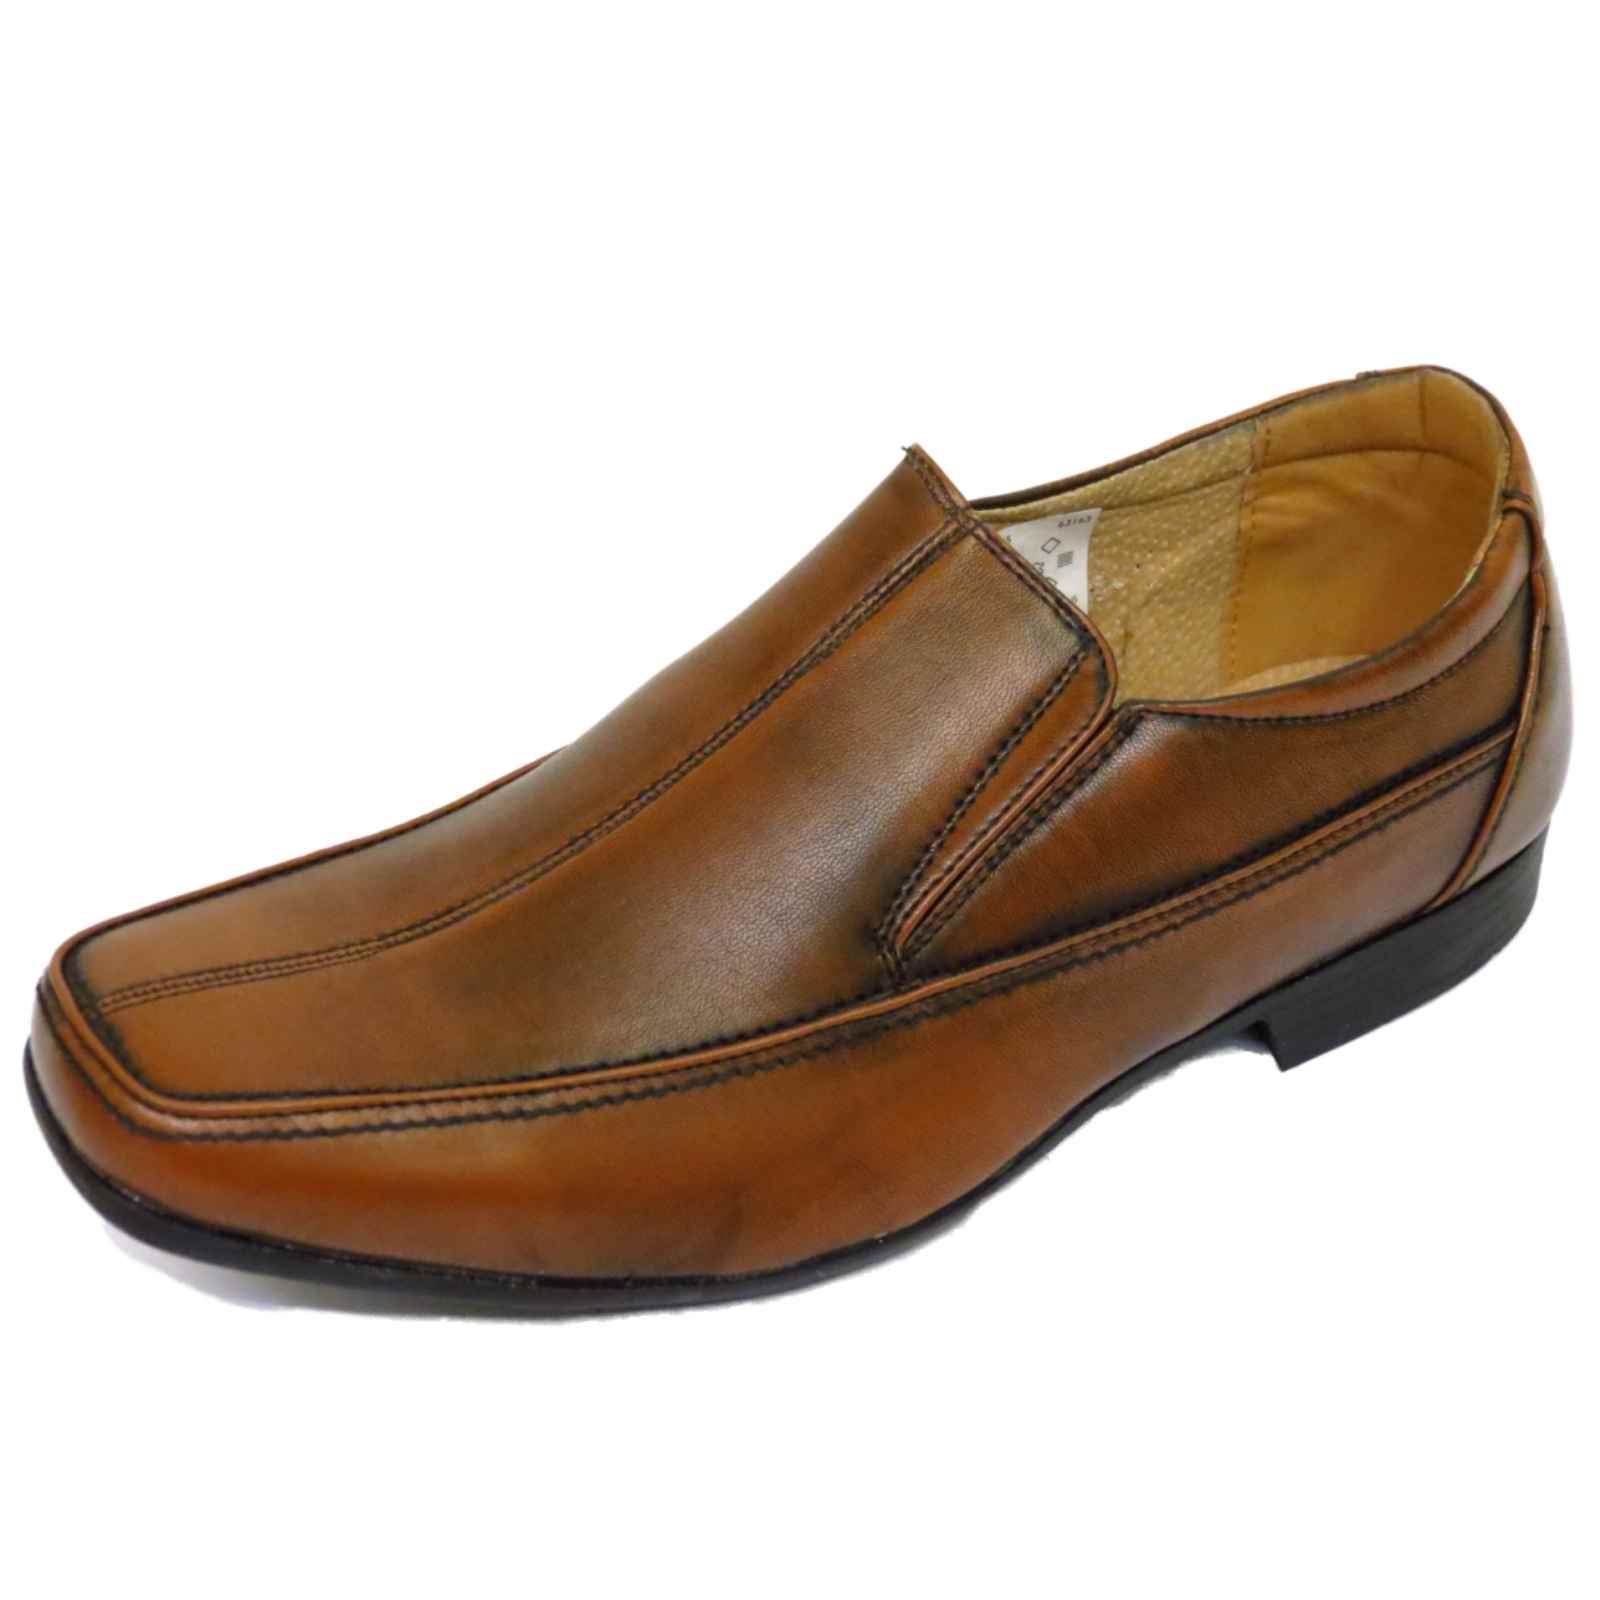 mens brown slip on work wedding smart casual loafers work